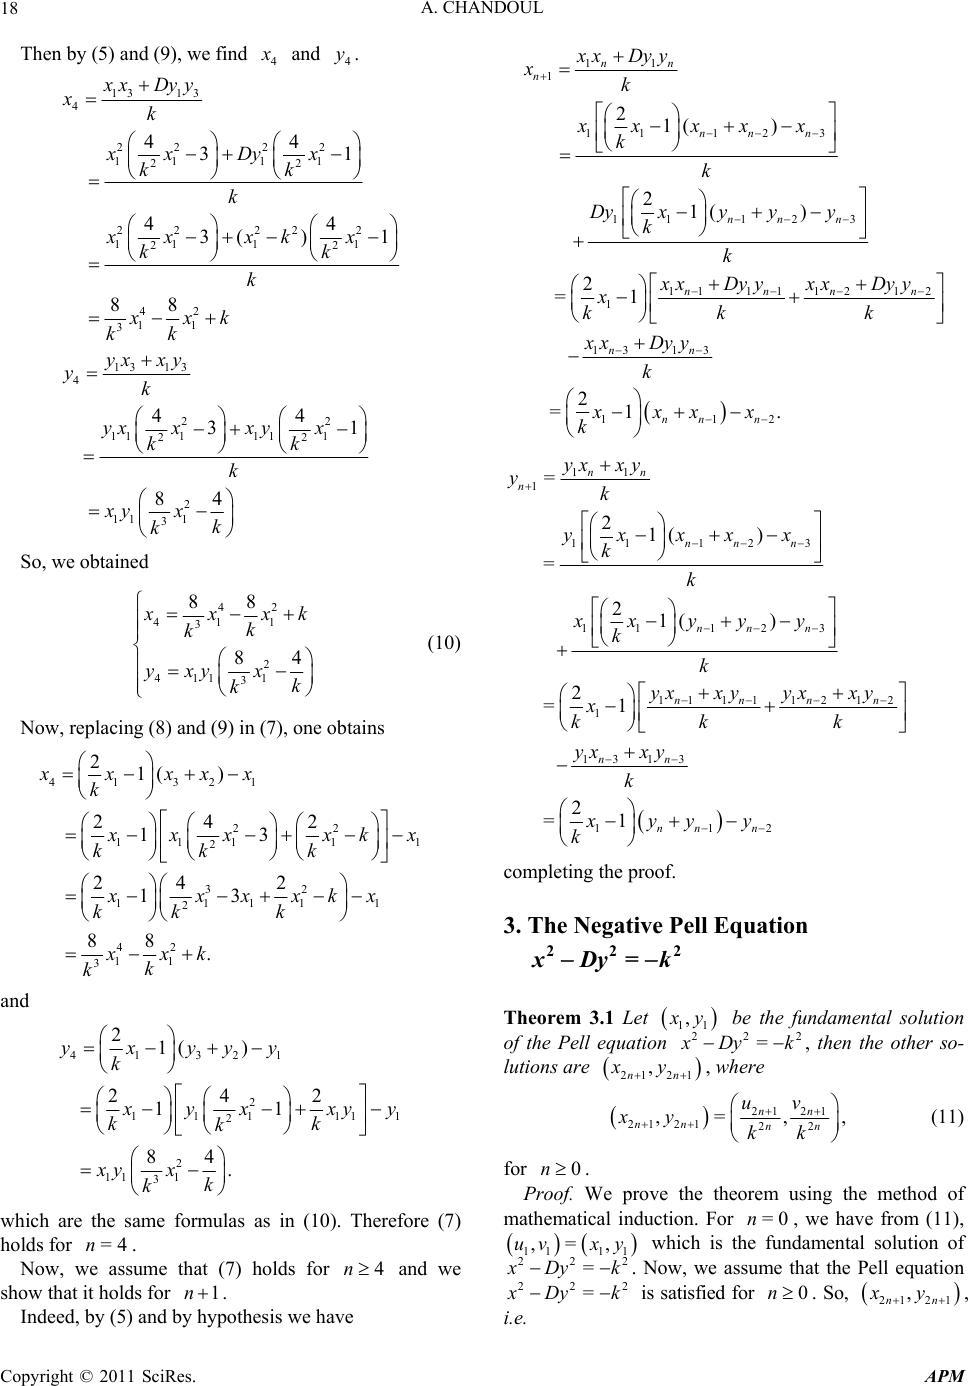 �9��^�K��kK.��.Y��_ThePellEquationX2-Dy2=±k2